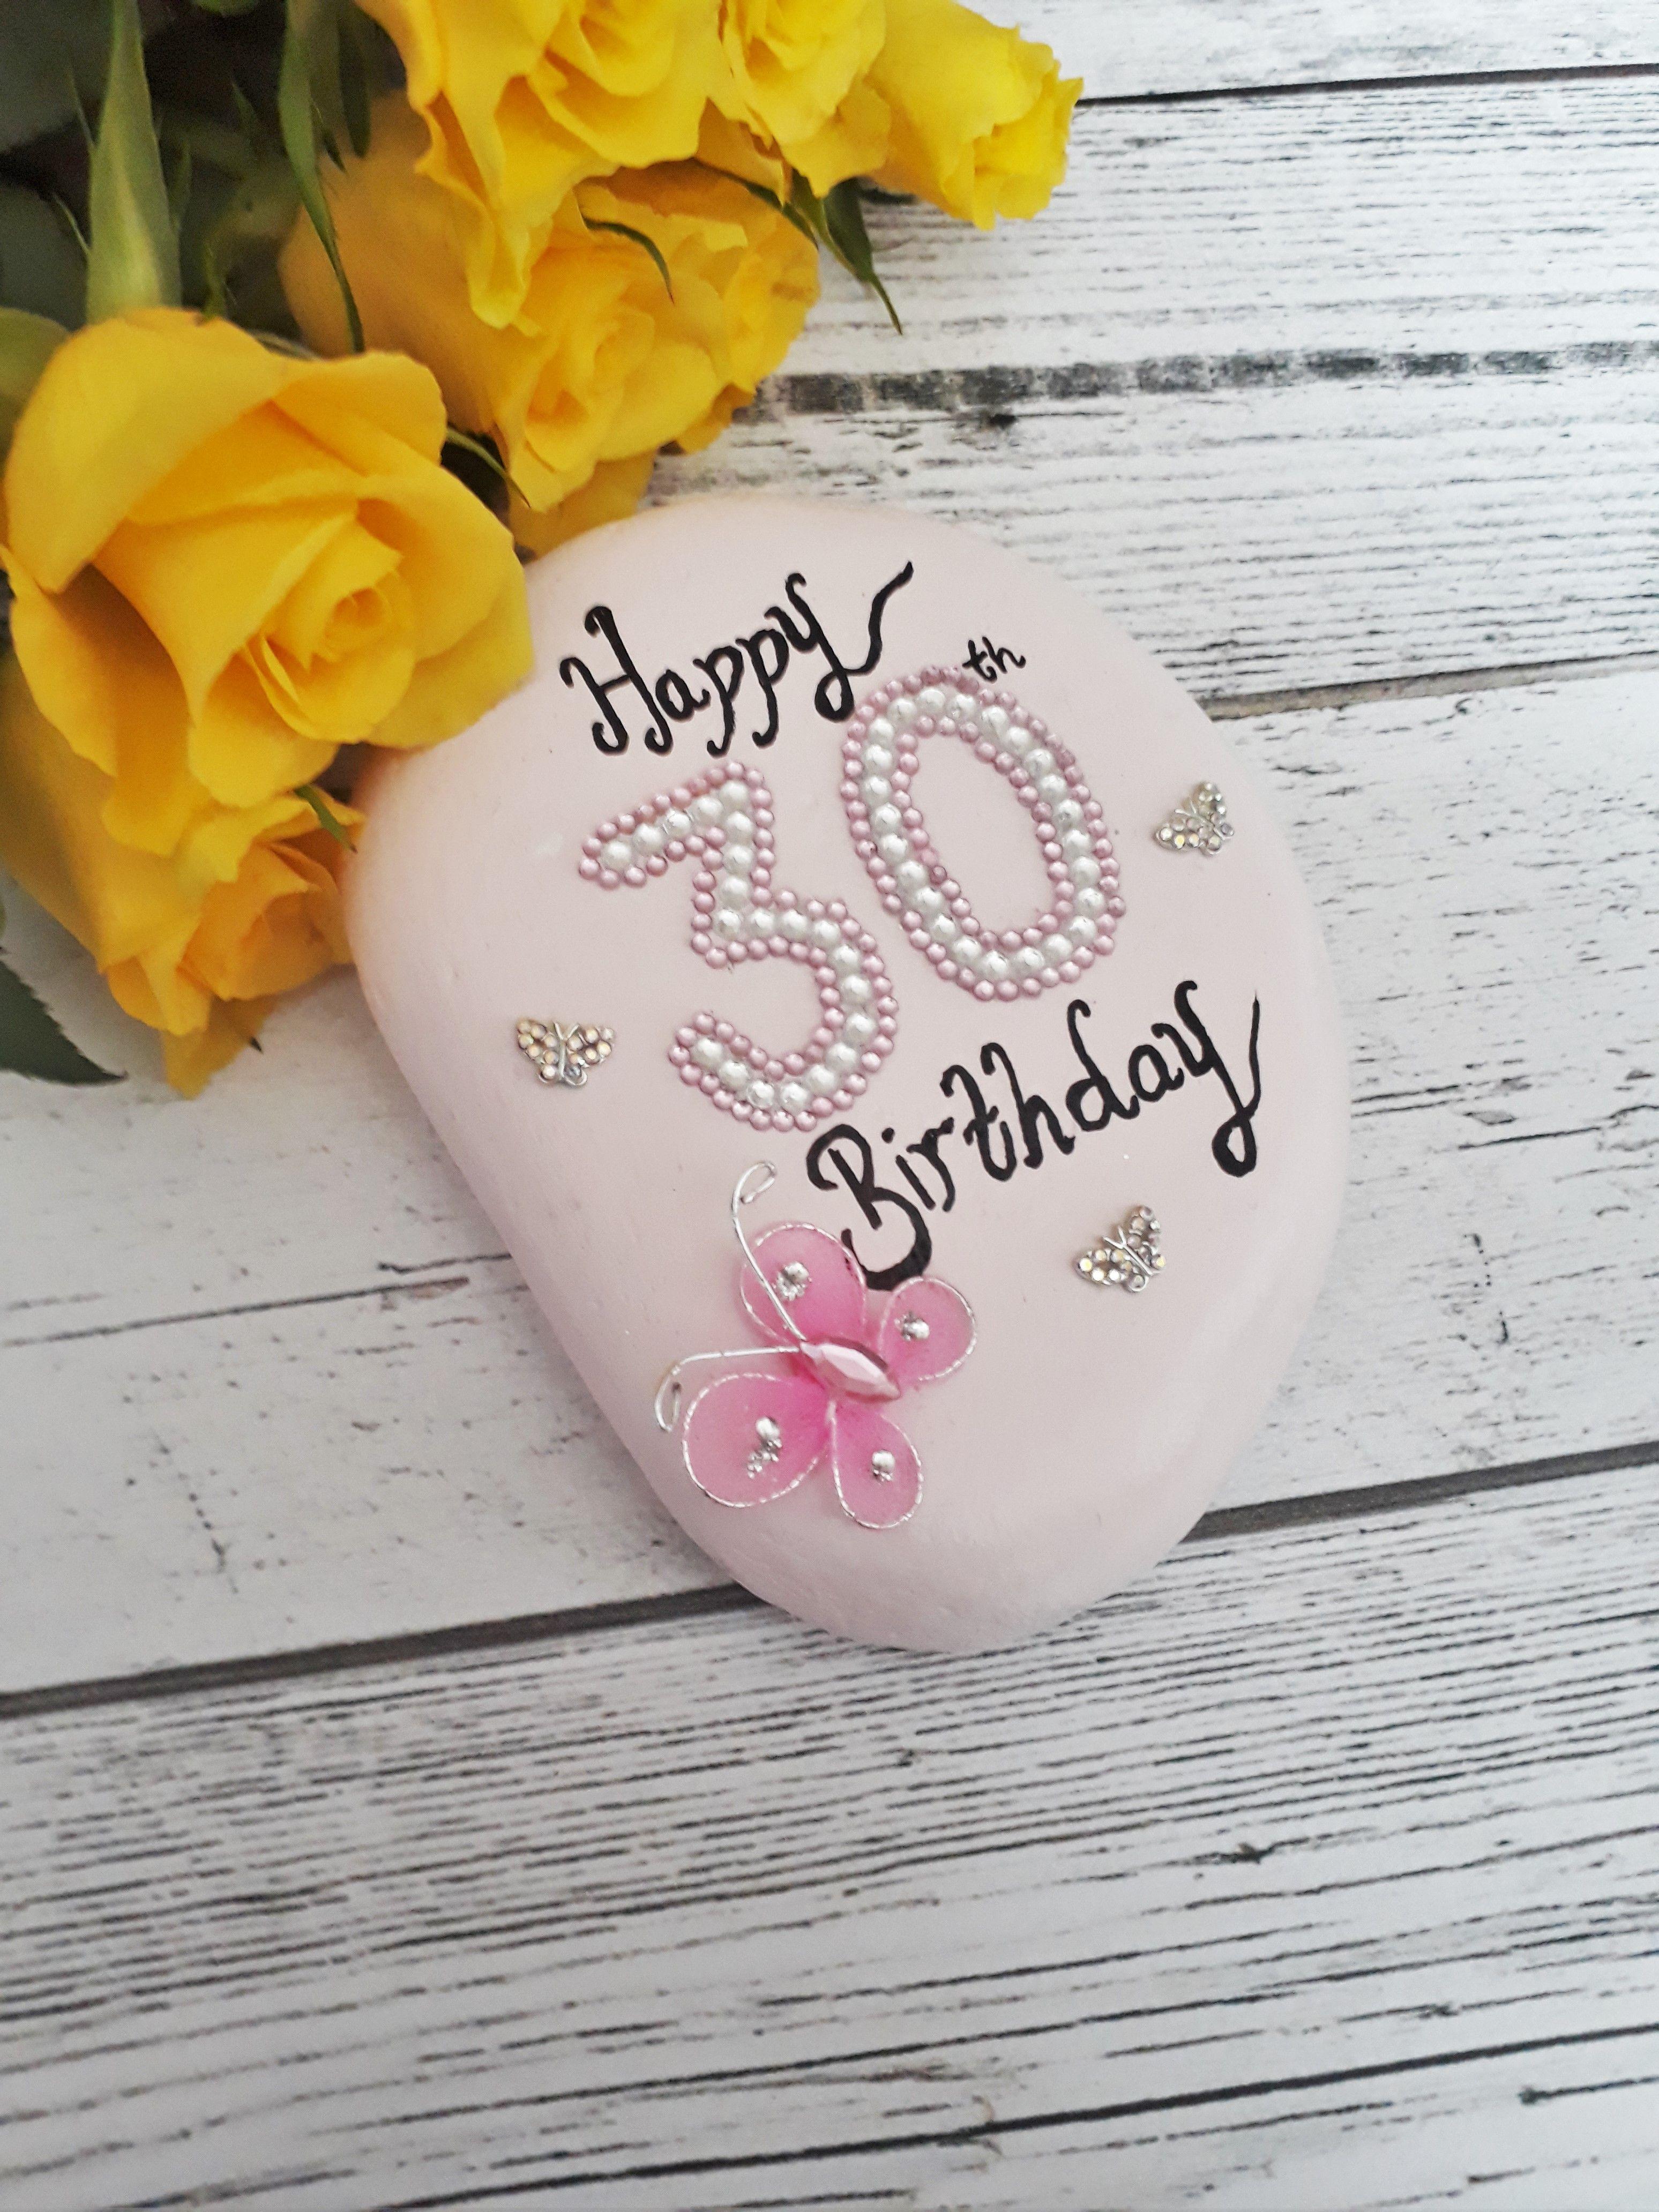 30th Birthday Gift Keepsake Celebration Pebble For